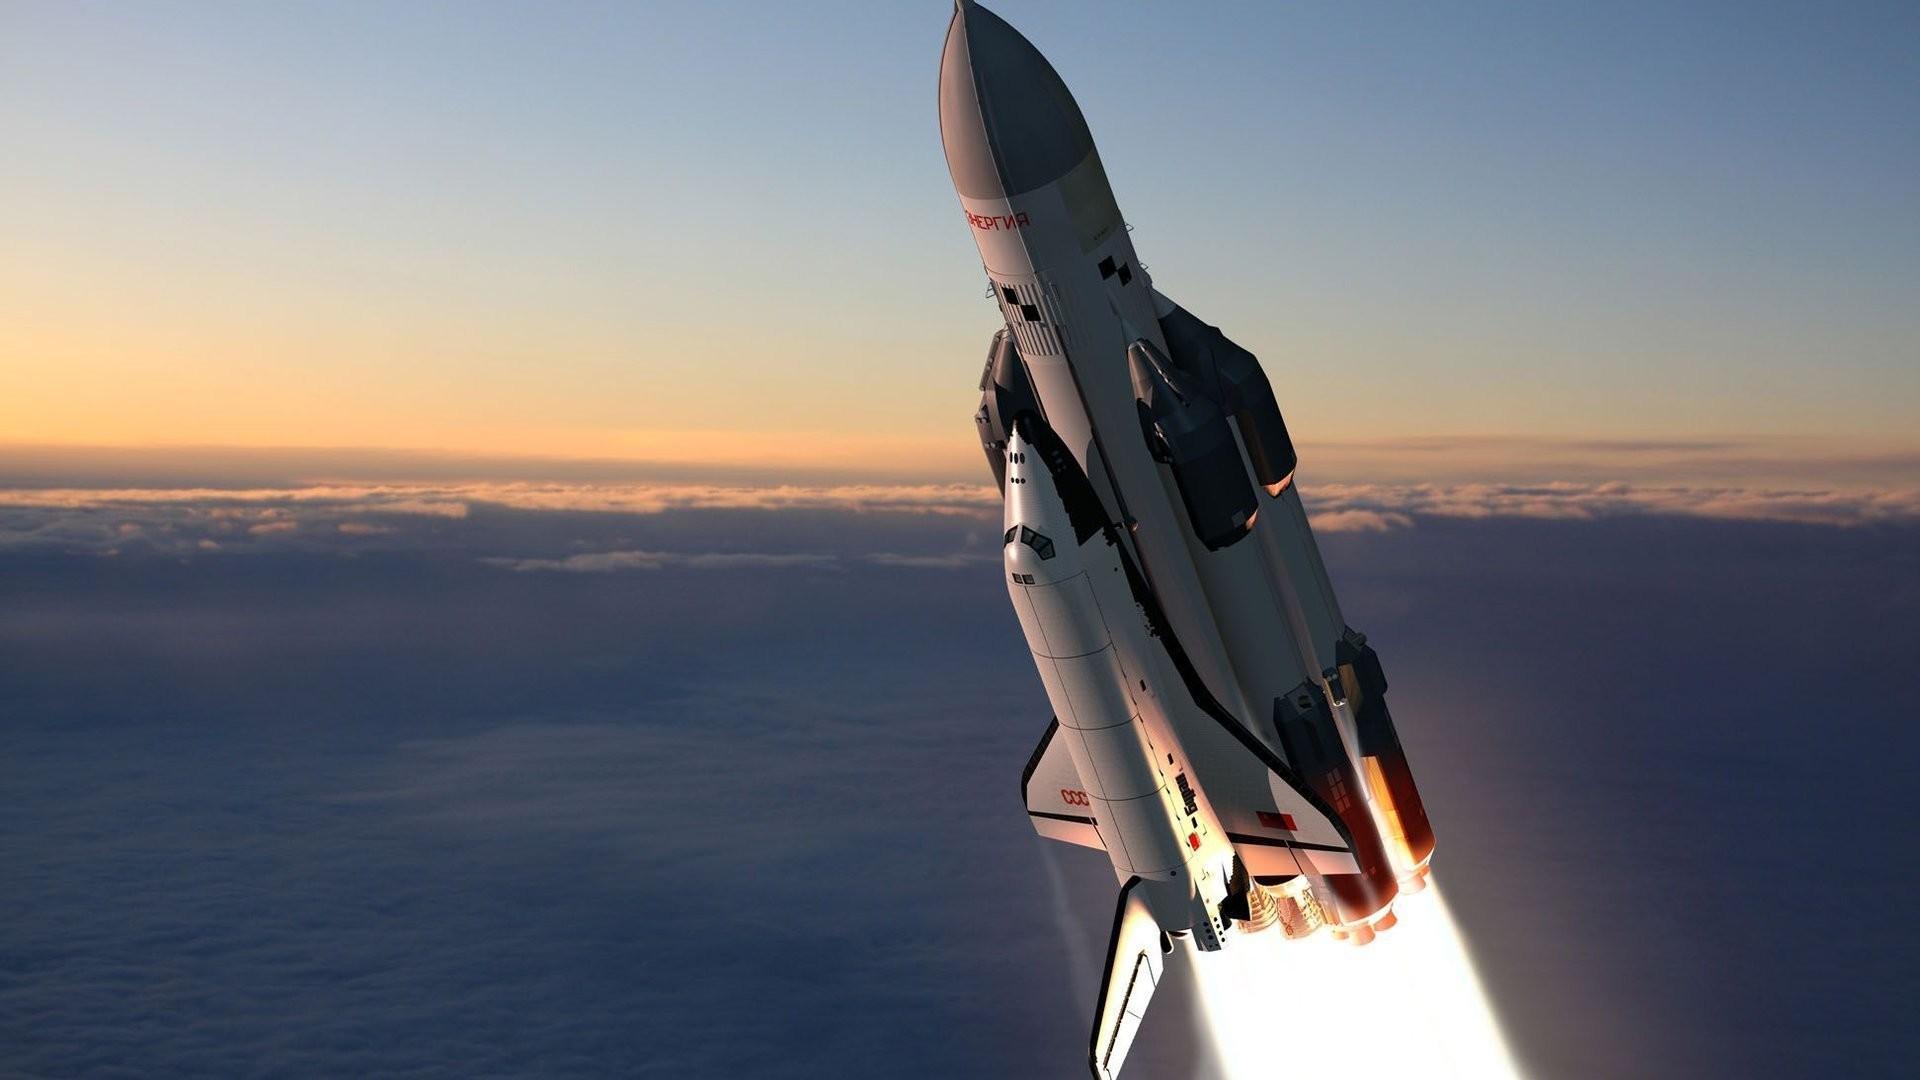 Gta V Tav 37 Valkyrie Ssto Space Shuttle From Avatar Movie – HD